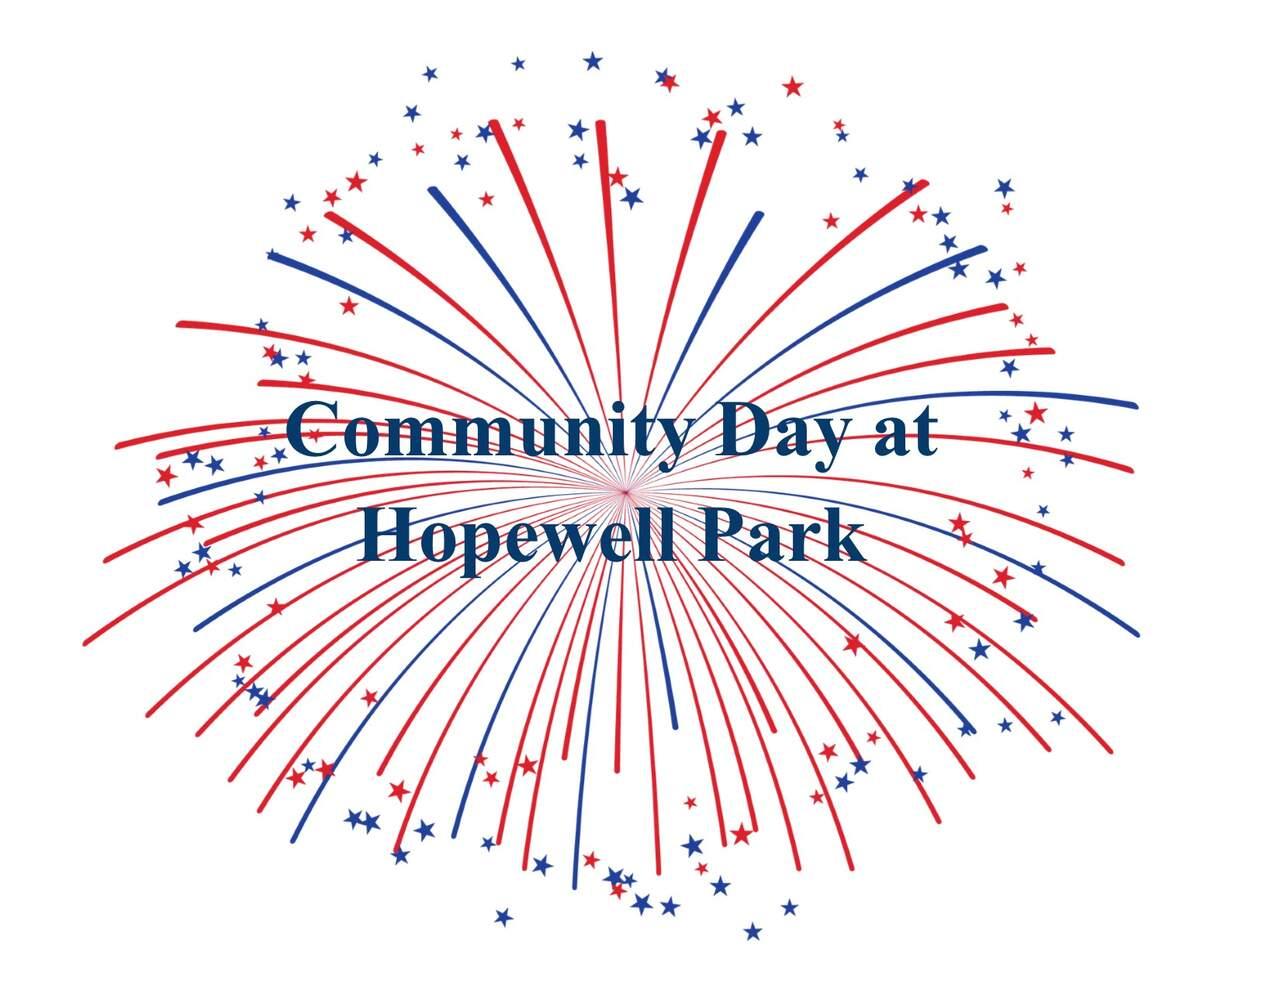 Hopewell Community Park - Community Day